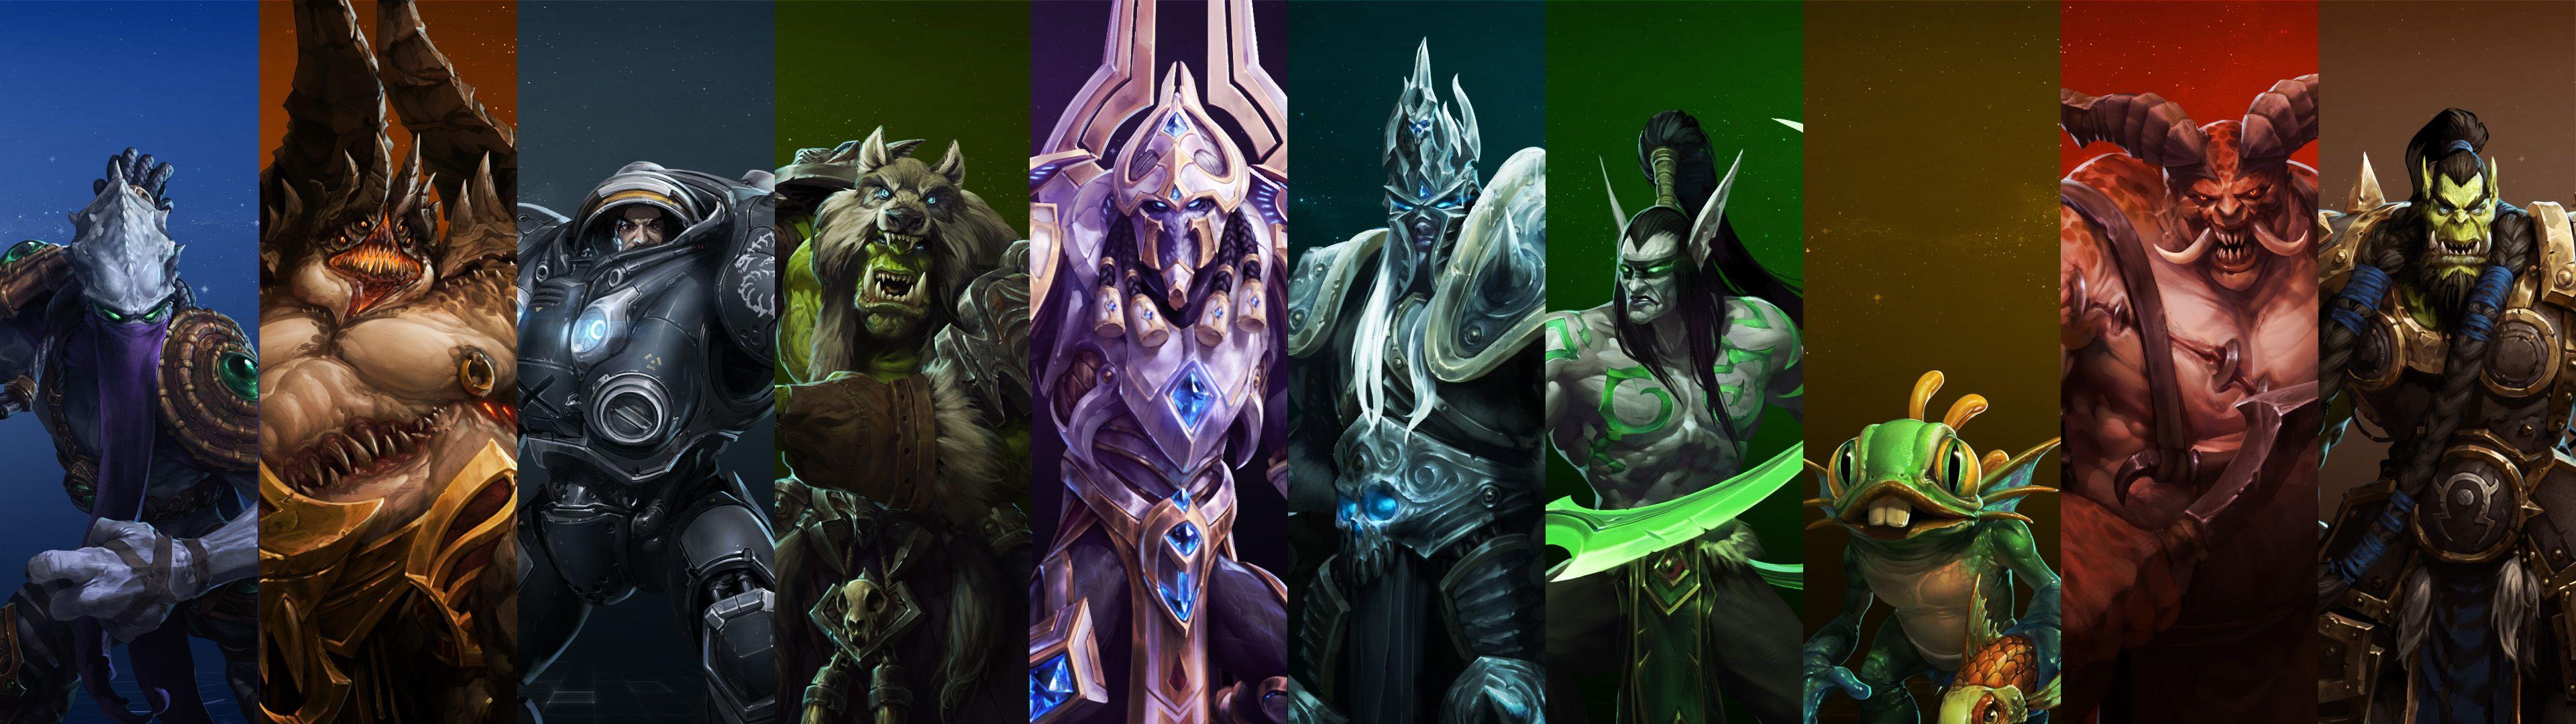 Heroes of the storm wallpaper dual screen warcraft - Heroes of the storm phone wallpaper ...